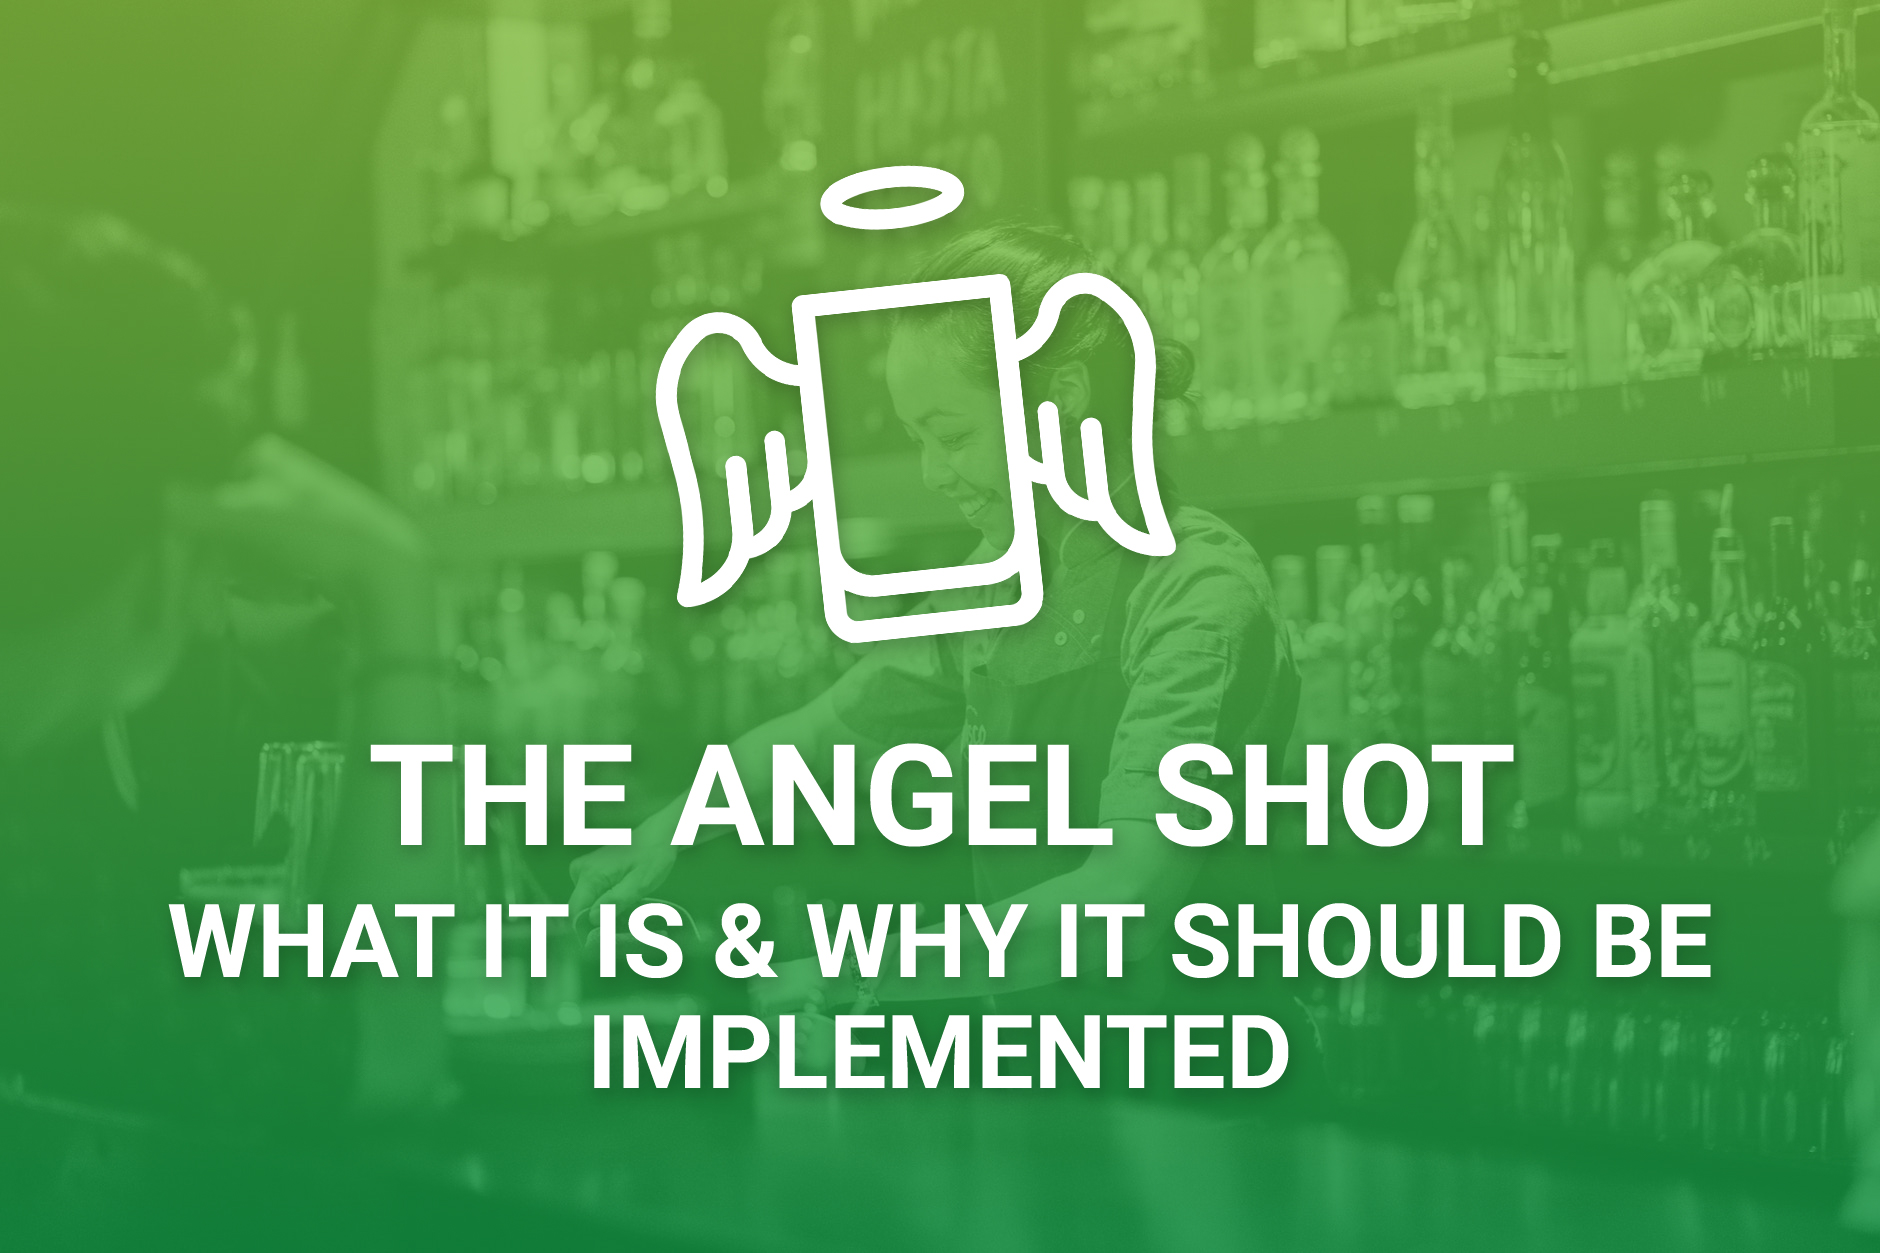 The Angel Shot